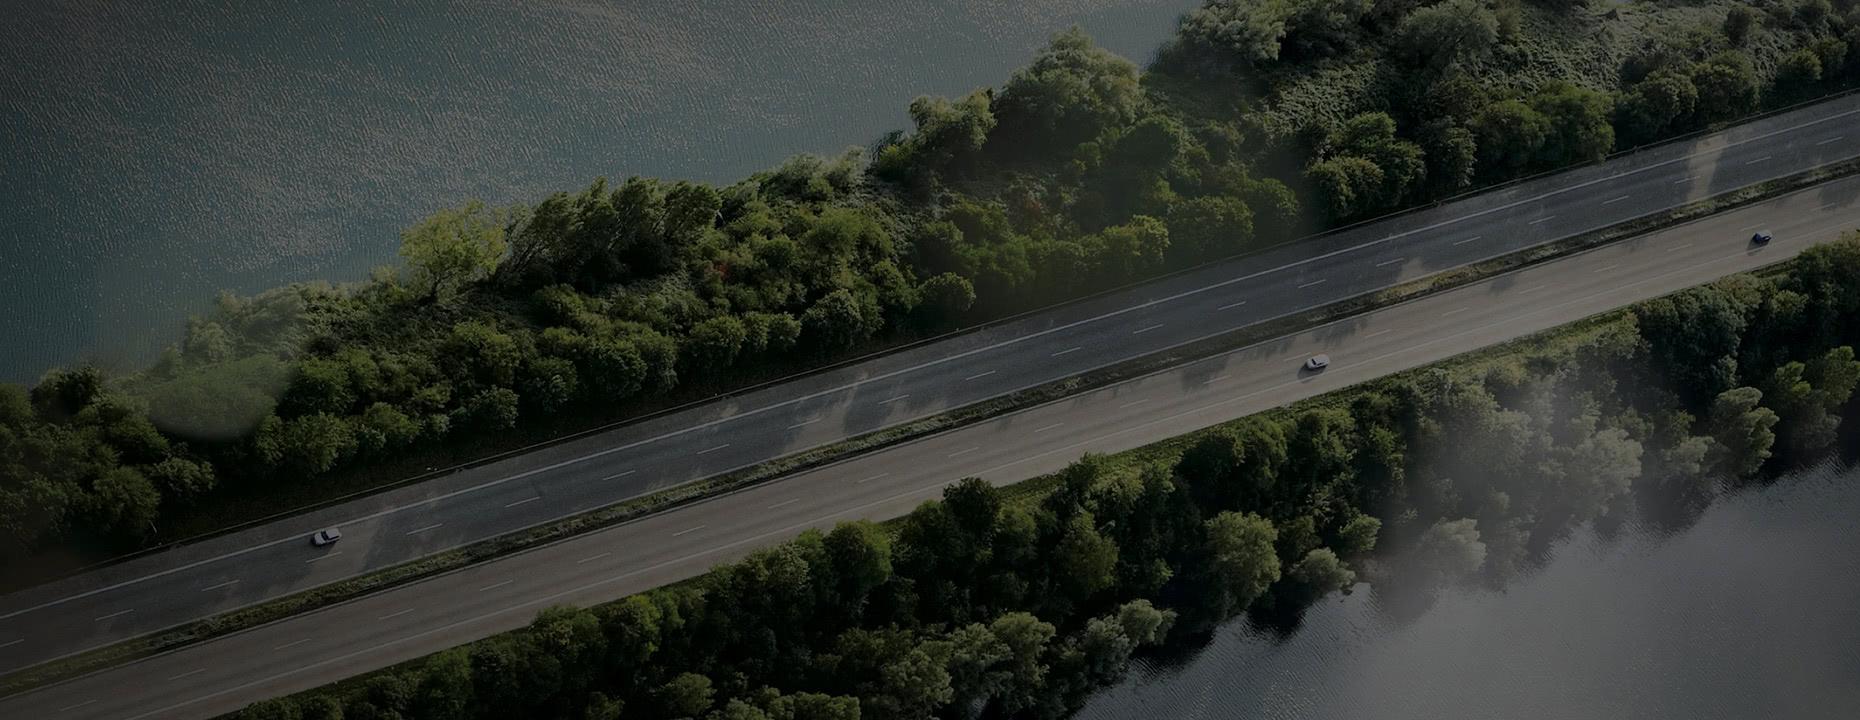 Поради з автостради #6 | ТОВ «Хюндай Центр Полтава» - фото 7